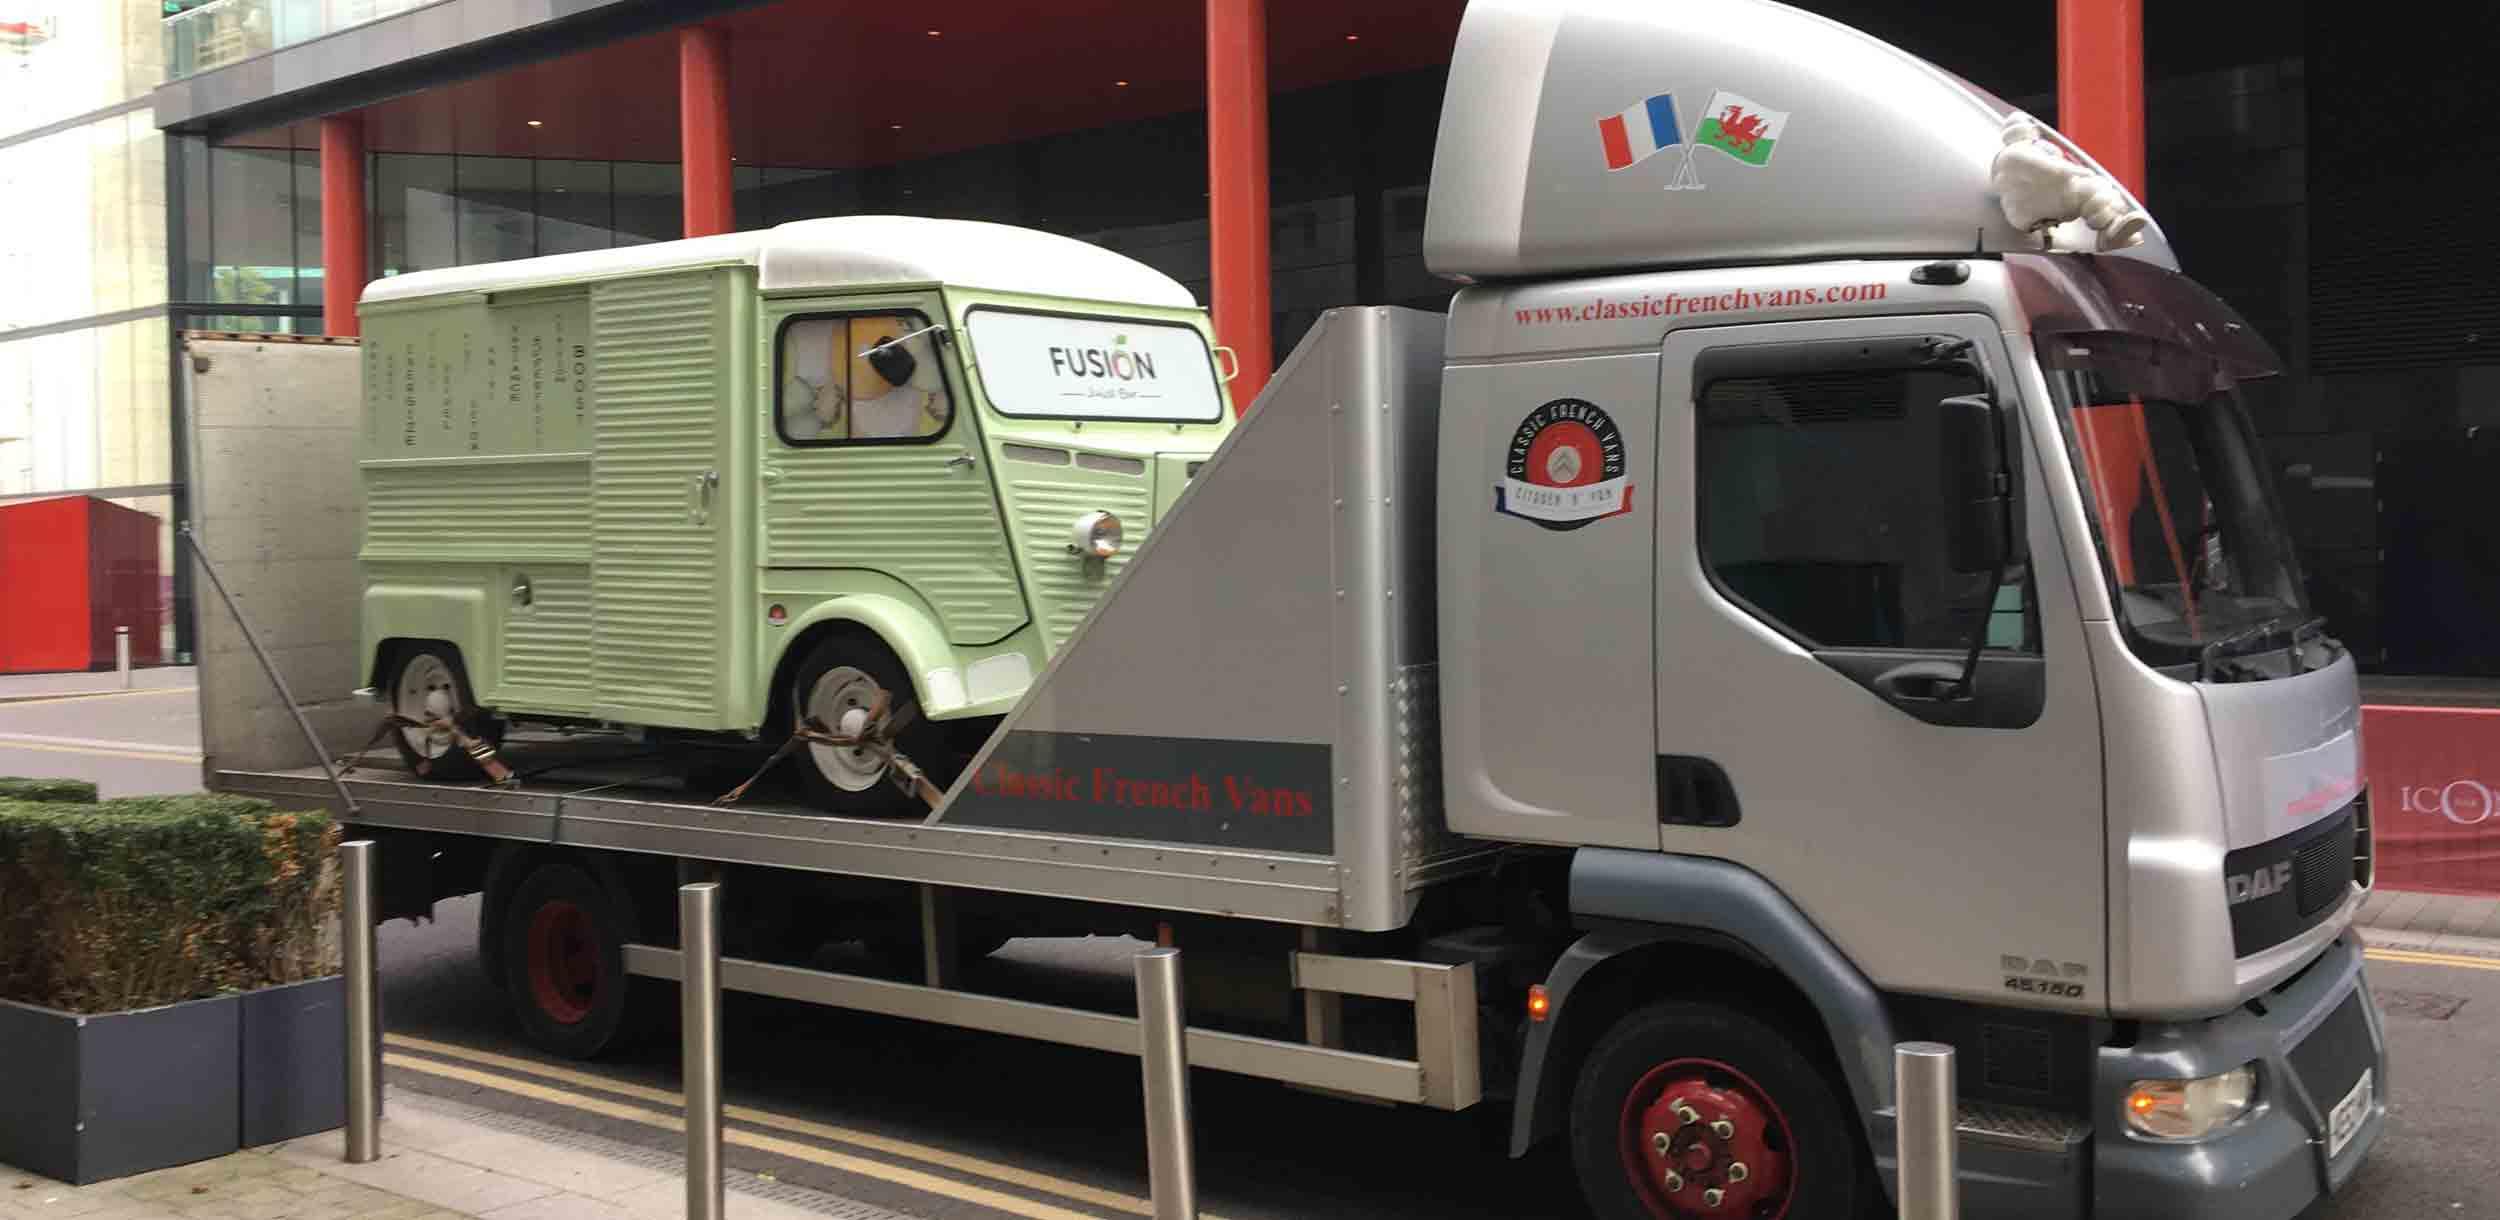 Promo Vehicle Transportation & Catering Truck Transportation